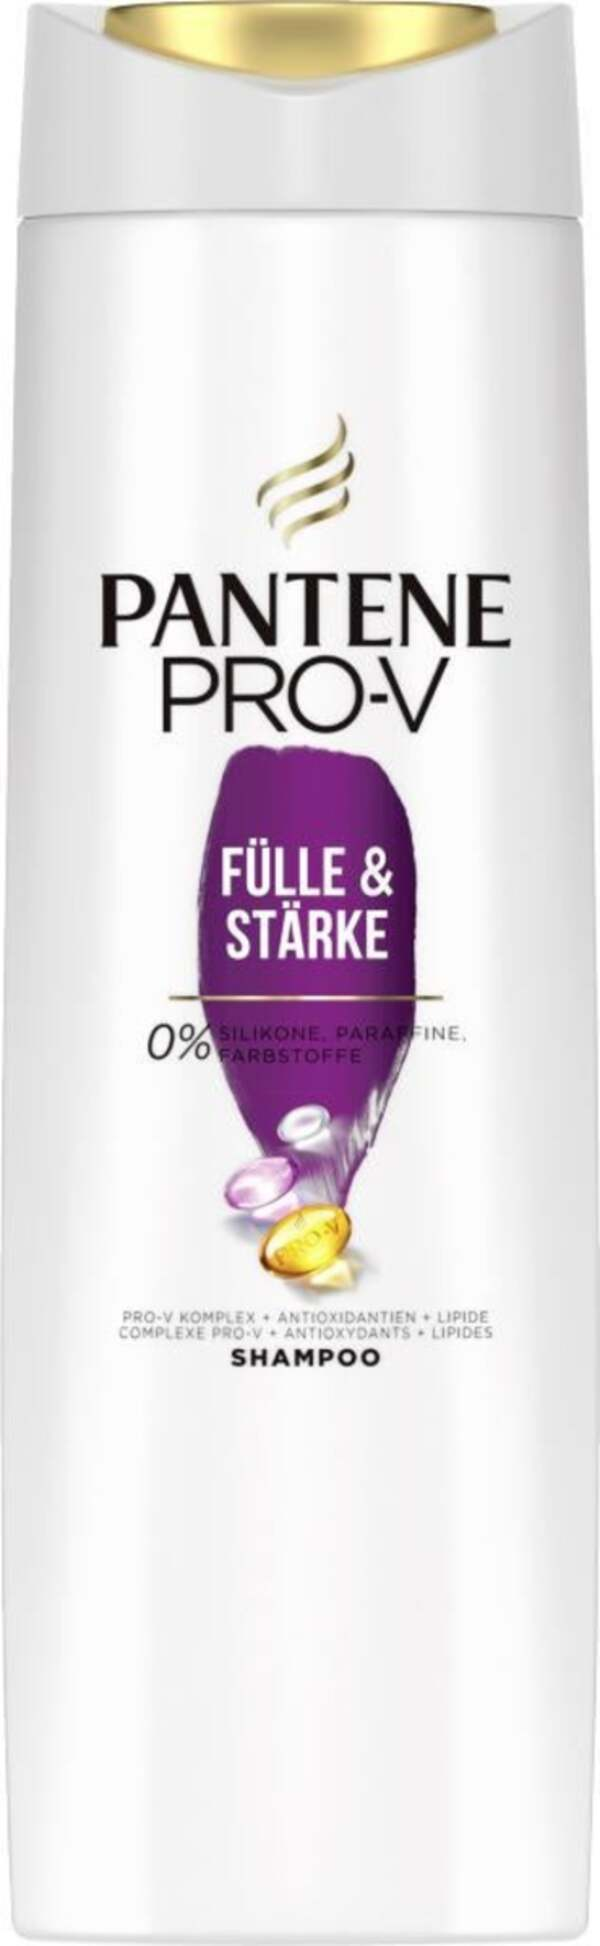 Pantene Pro-V Fülle & Stärke Shampoo